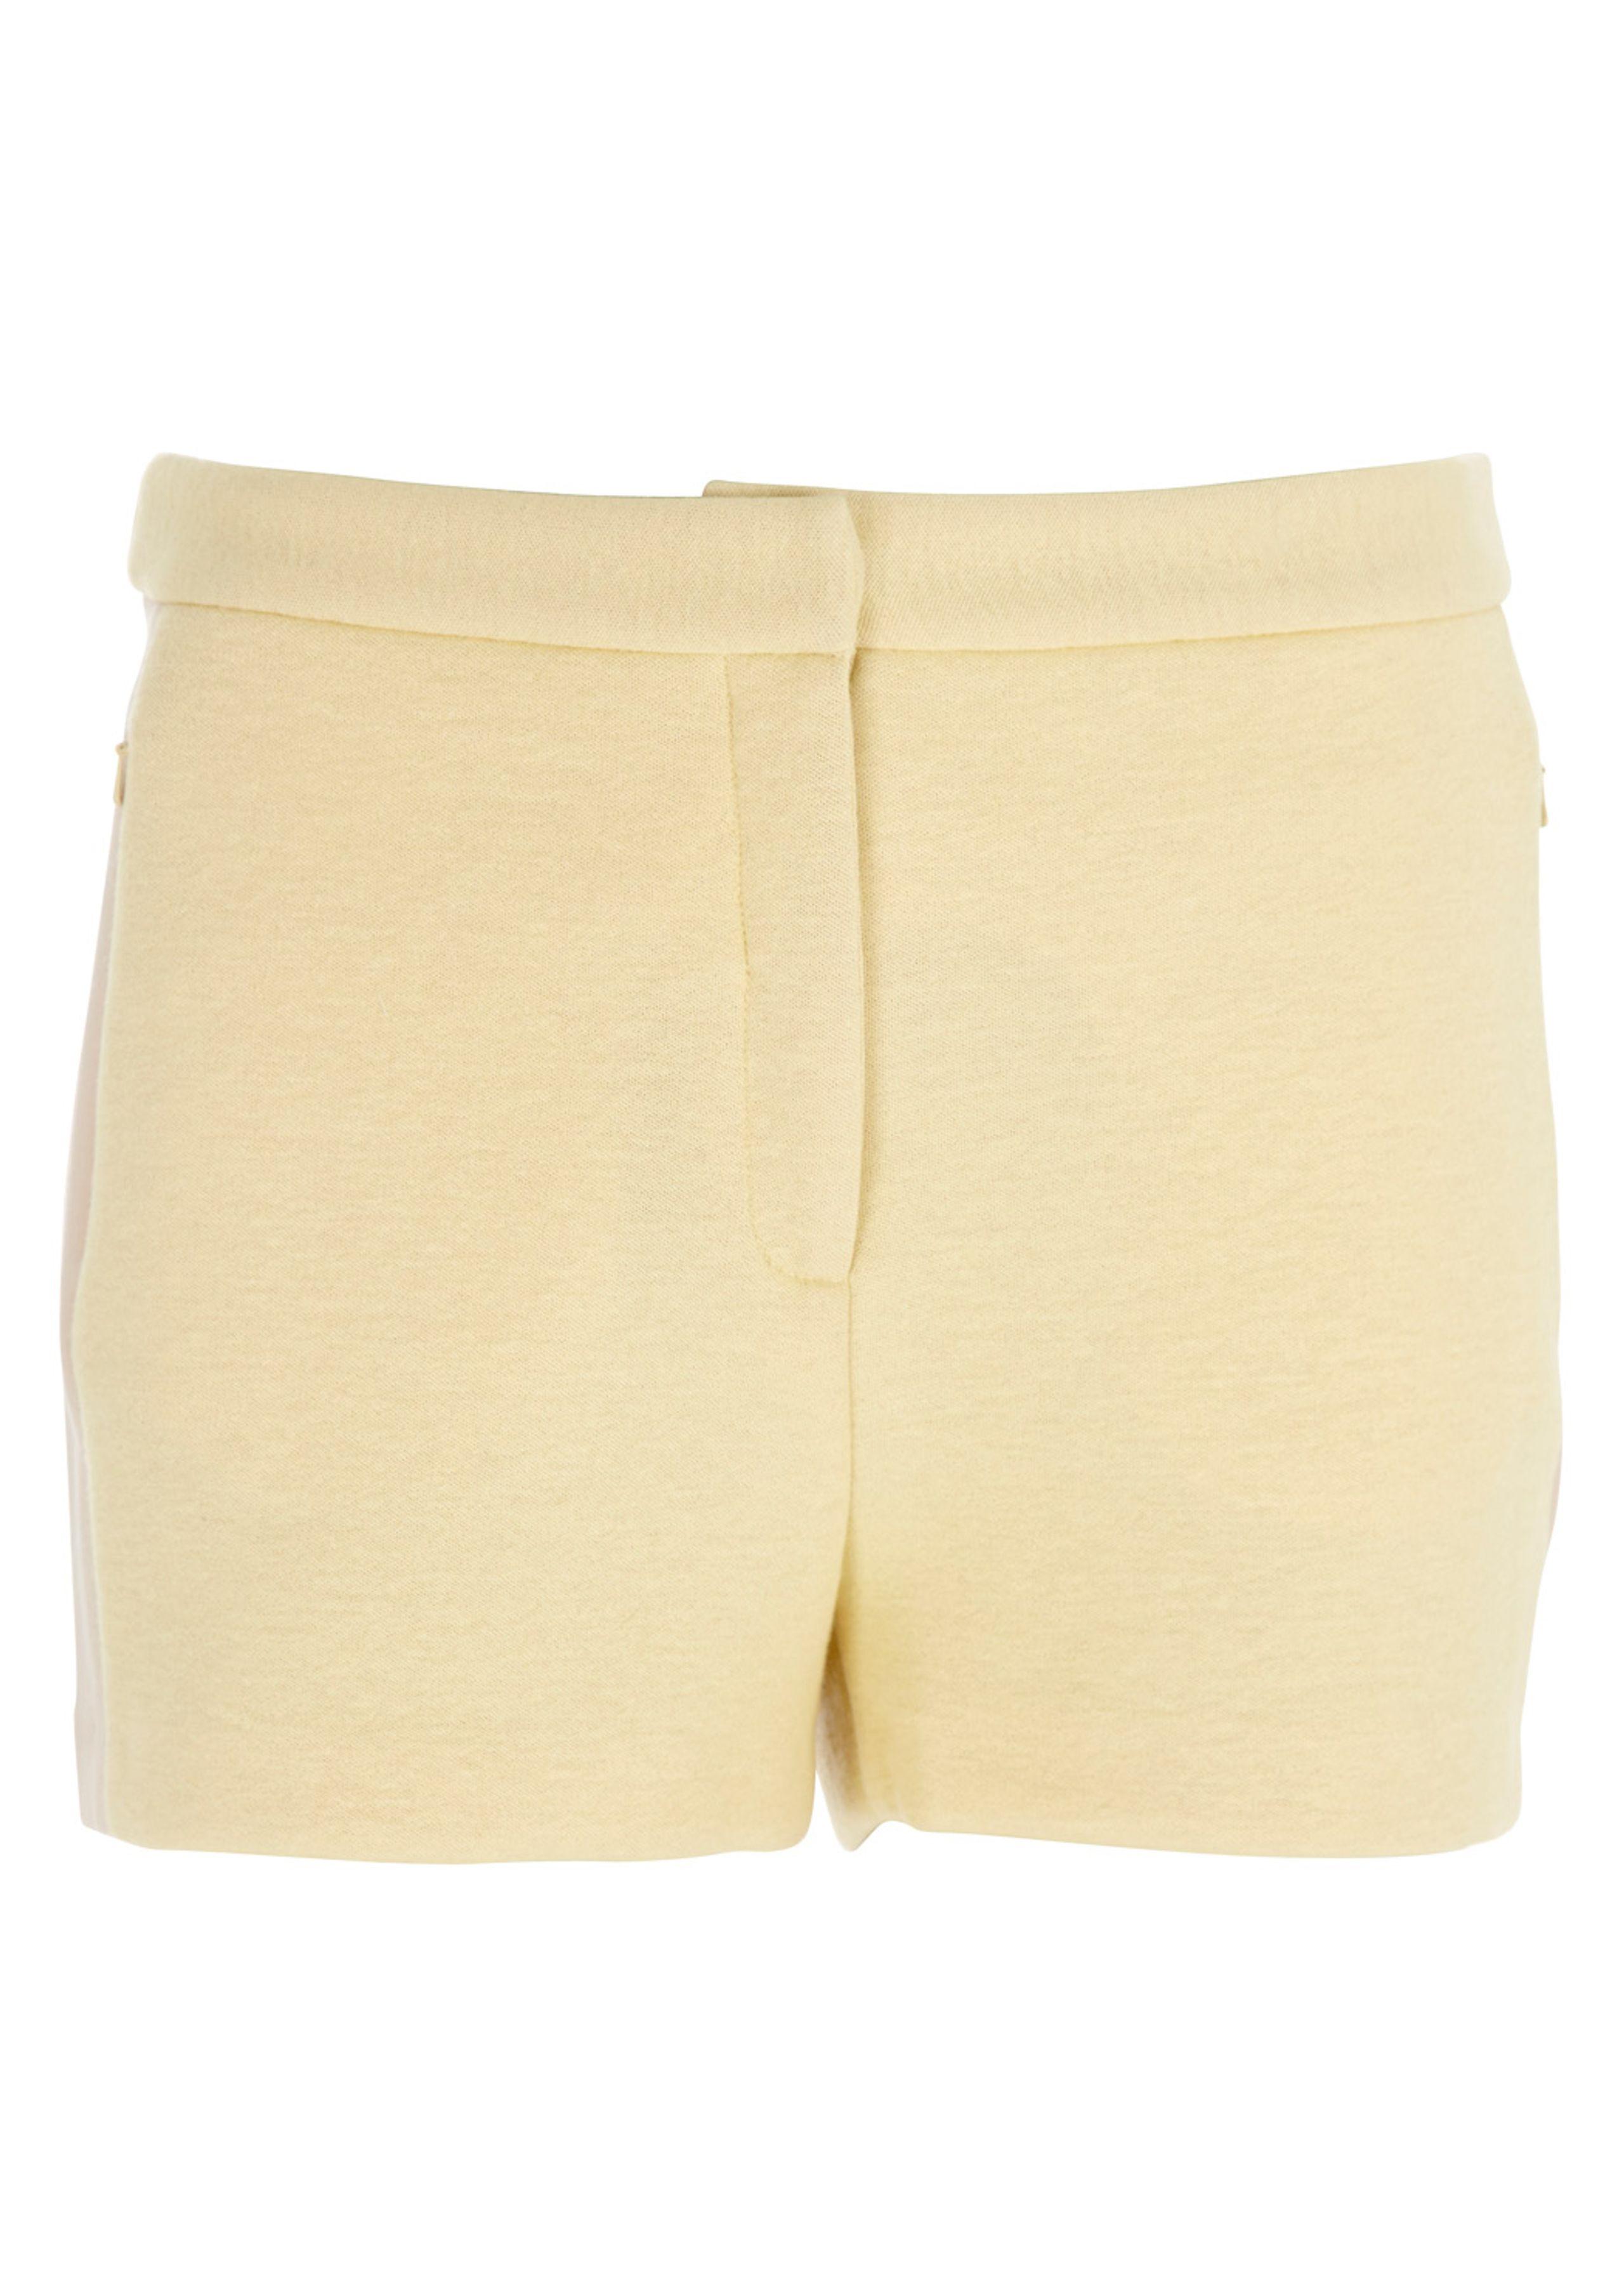 Lifa shorts